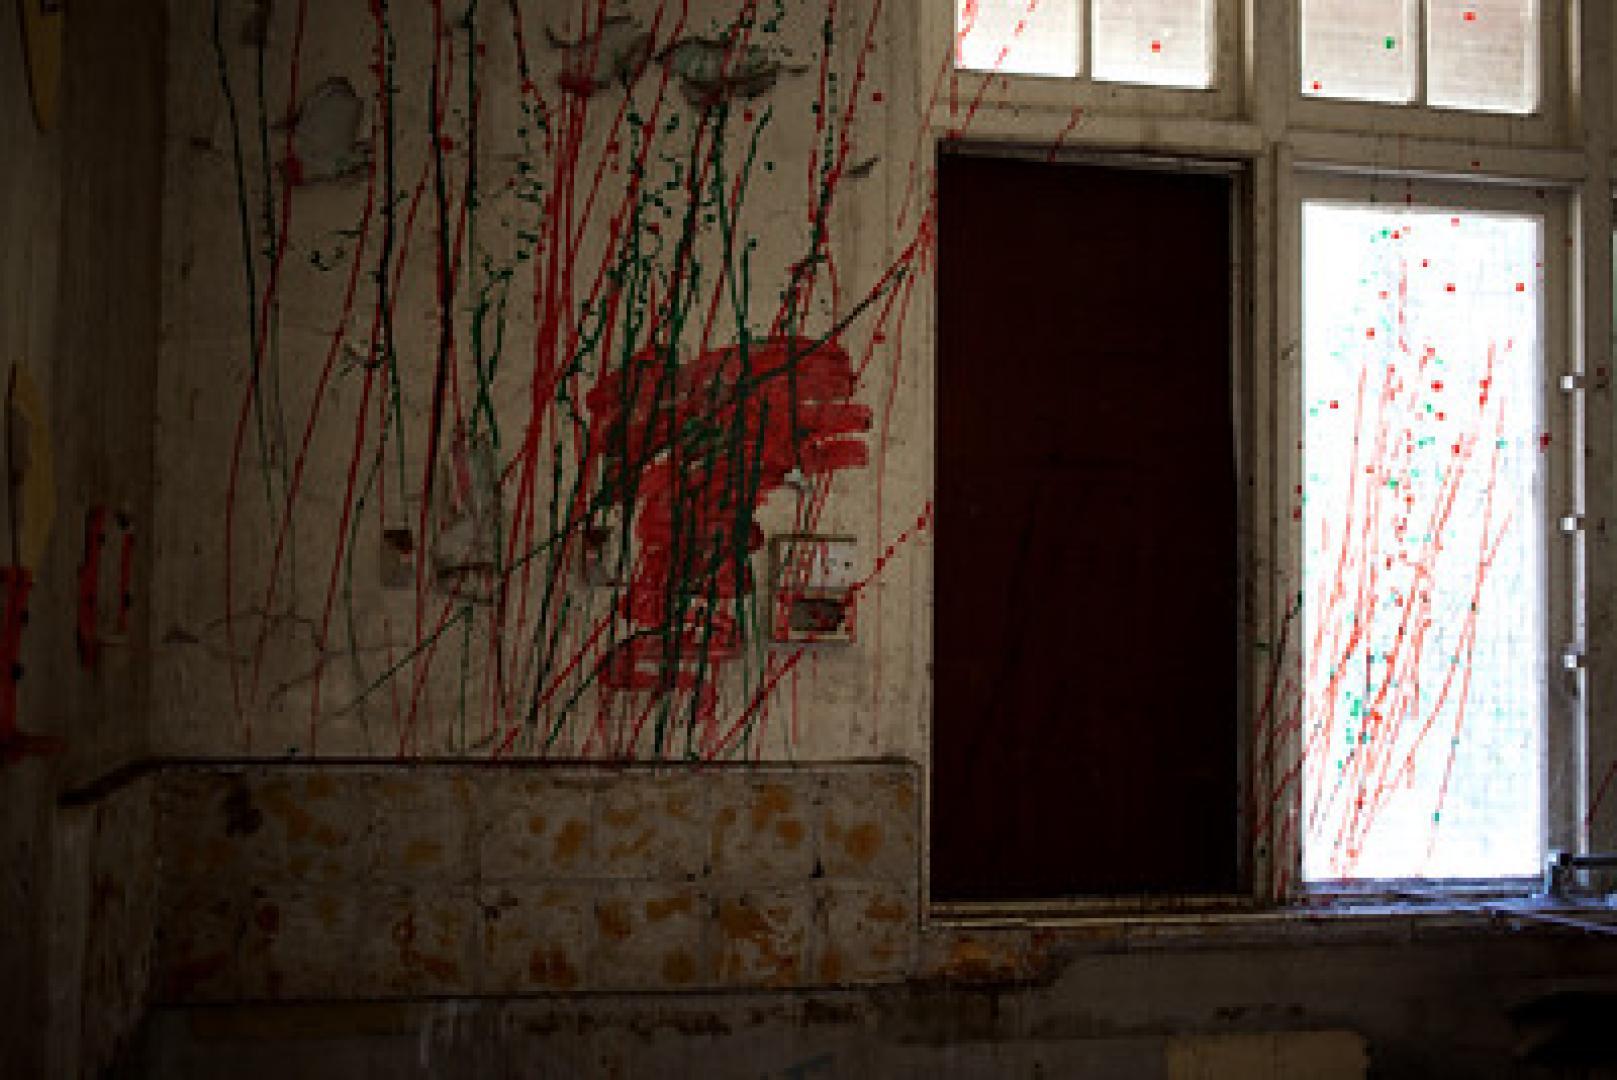 Gladesville Mental Hospital 8. kép